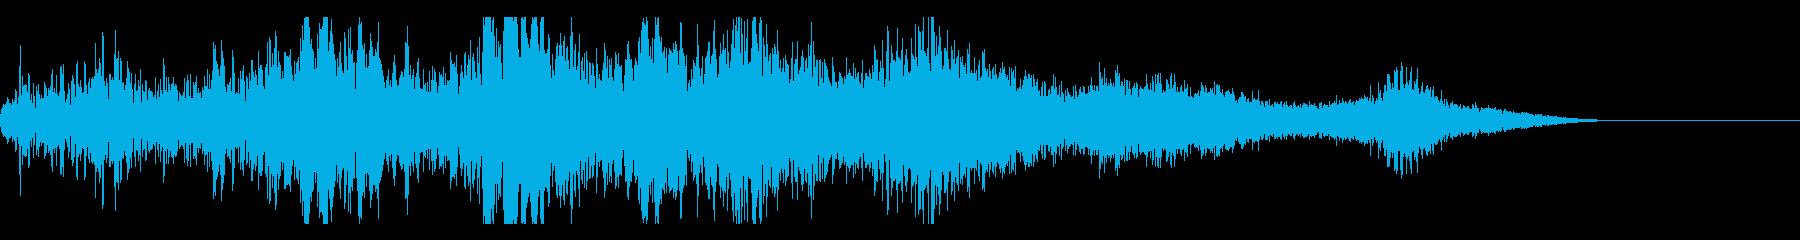 Sci Fiライザー、マシン、電子...の再生済みの波形